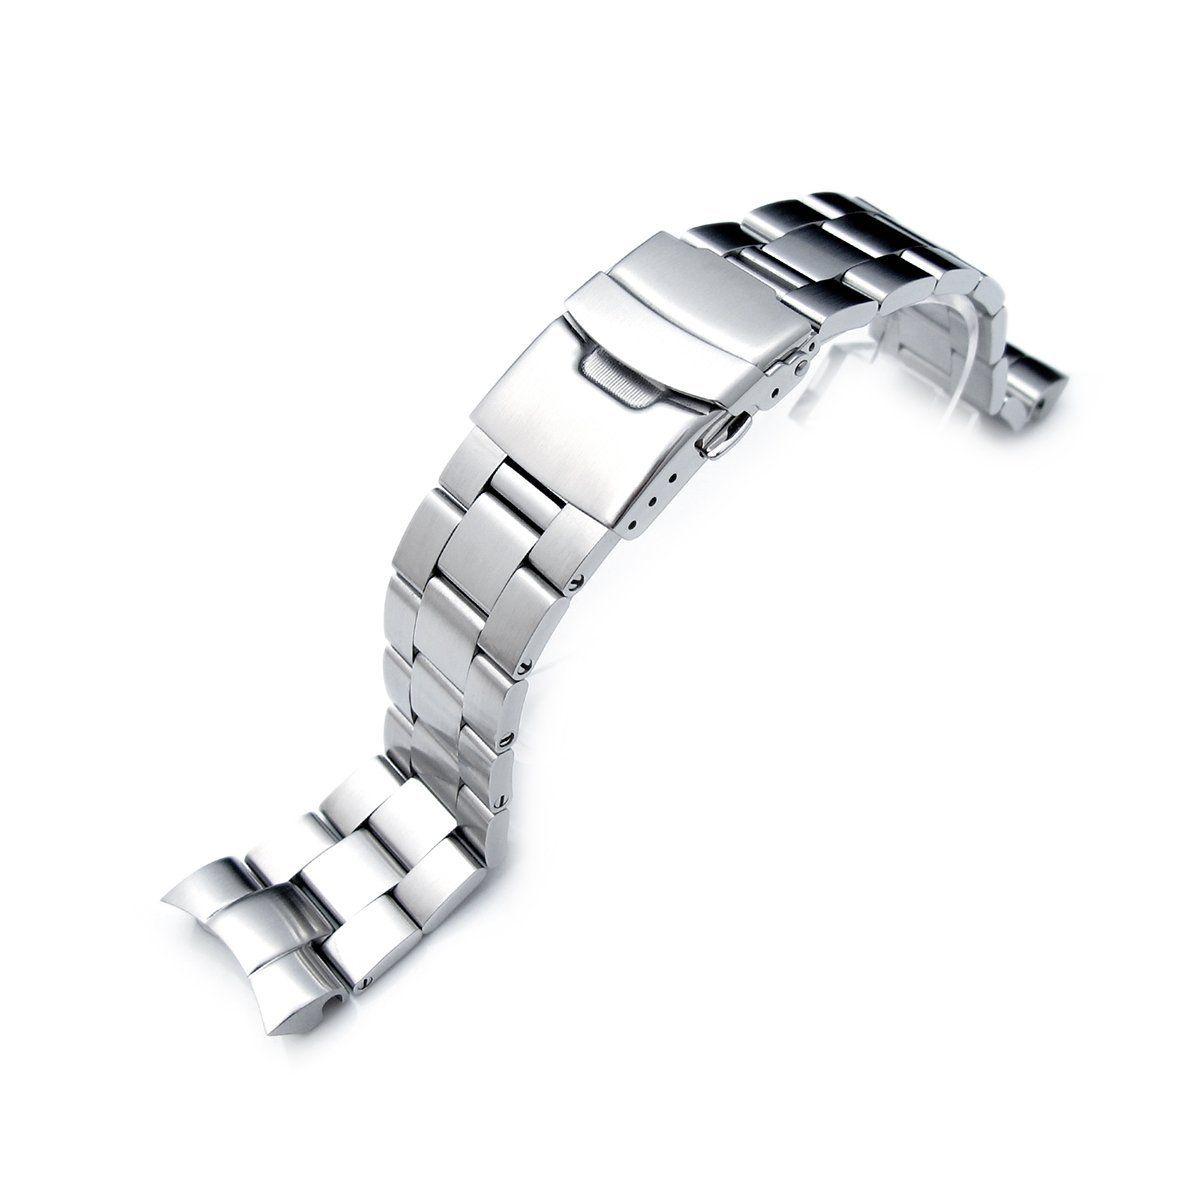 22mm supero boyer watch bracelet for seiko snzf17 sea